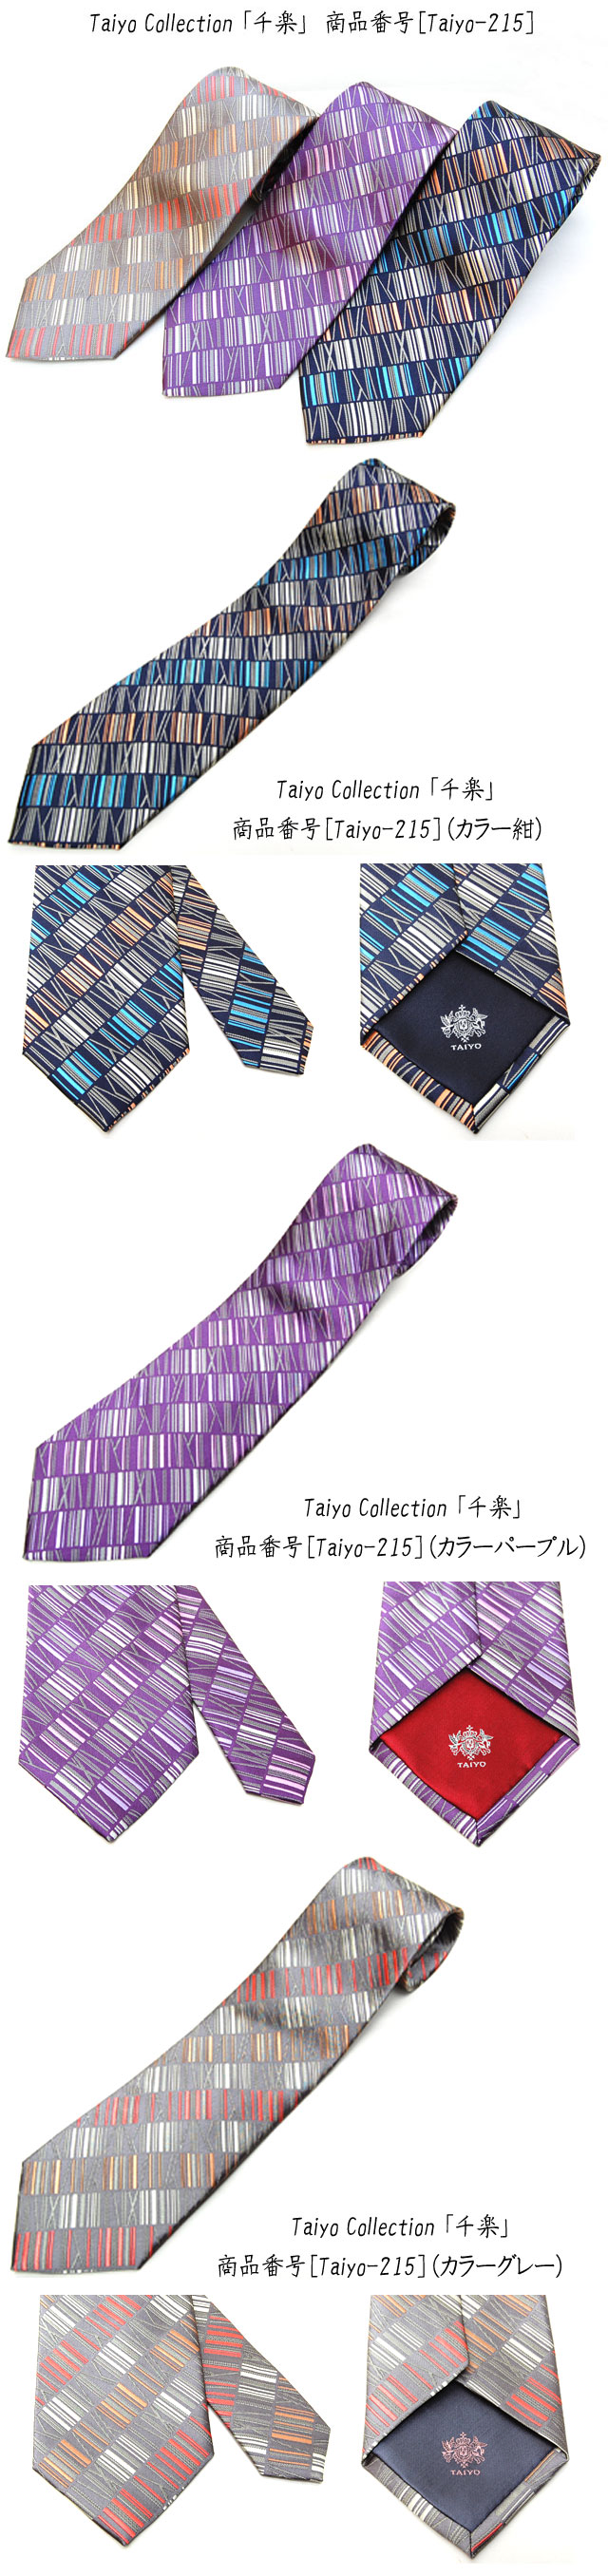 taiyo-215-2